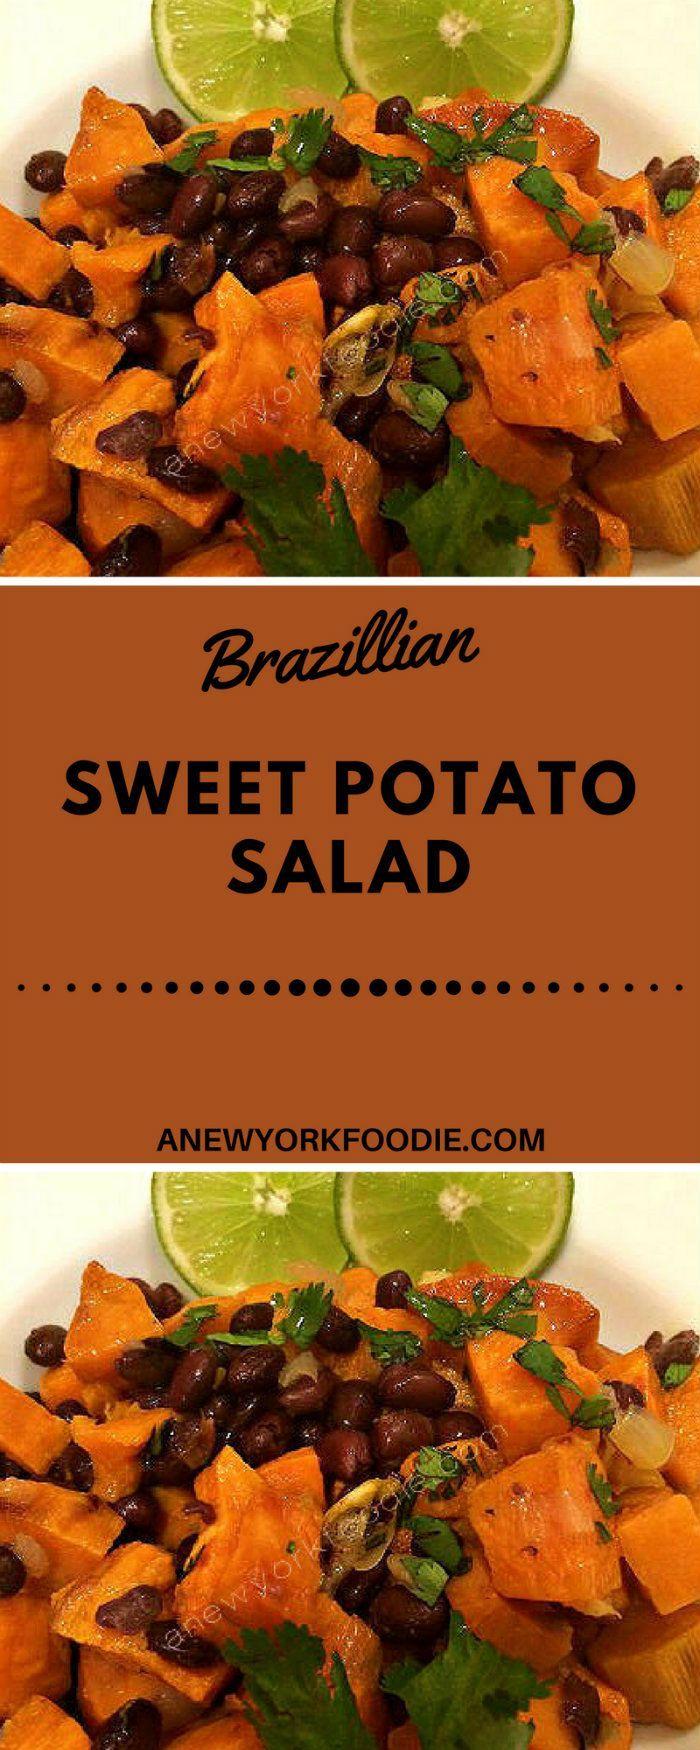 how to make black folks potato salad